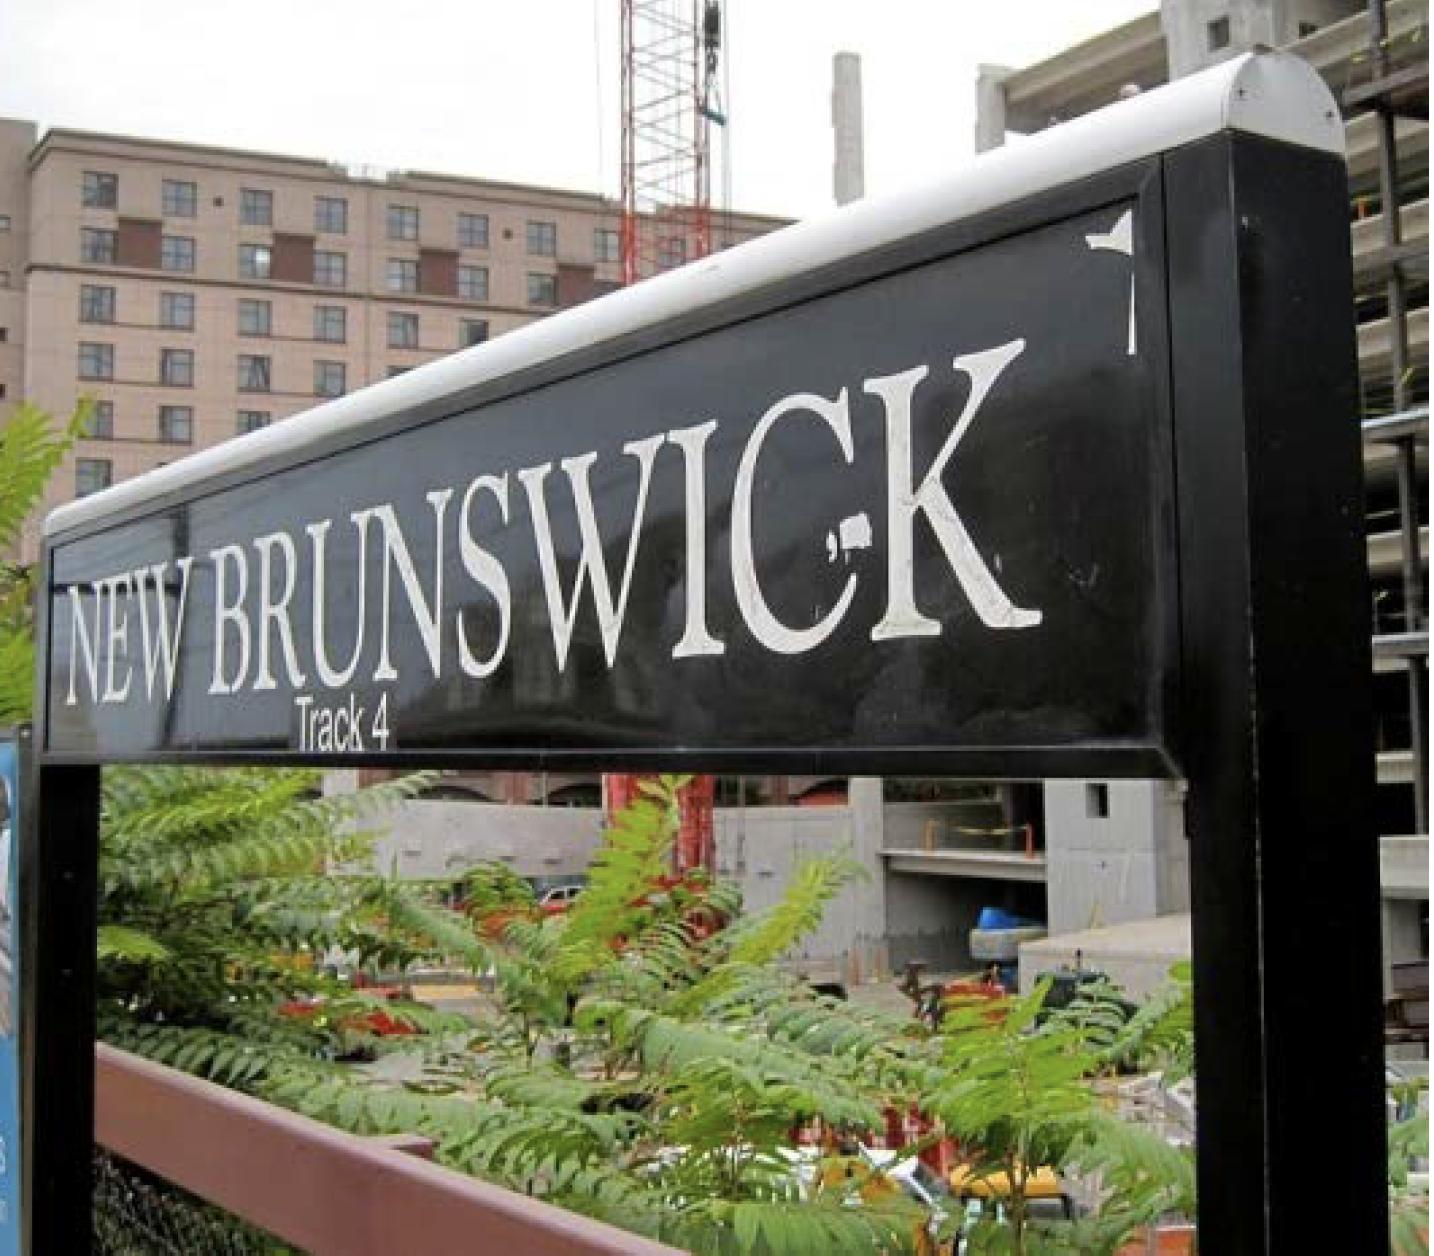 New Brunswick Tomorrow Rutgers Voorhees Civic Engagement